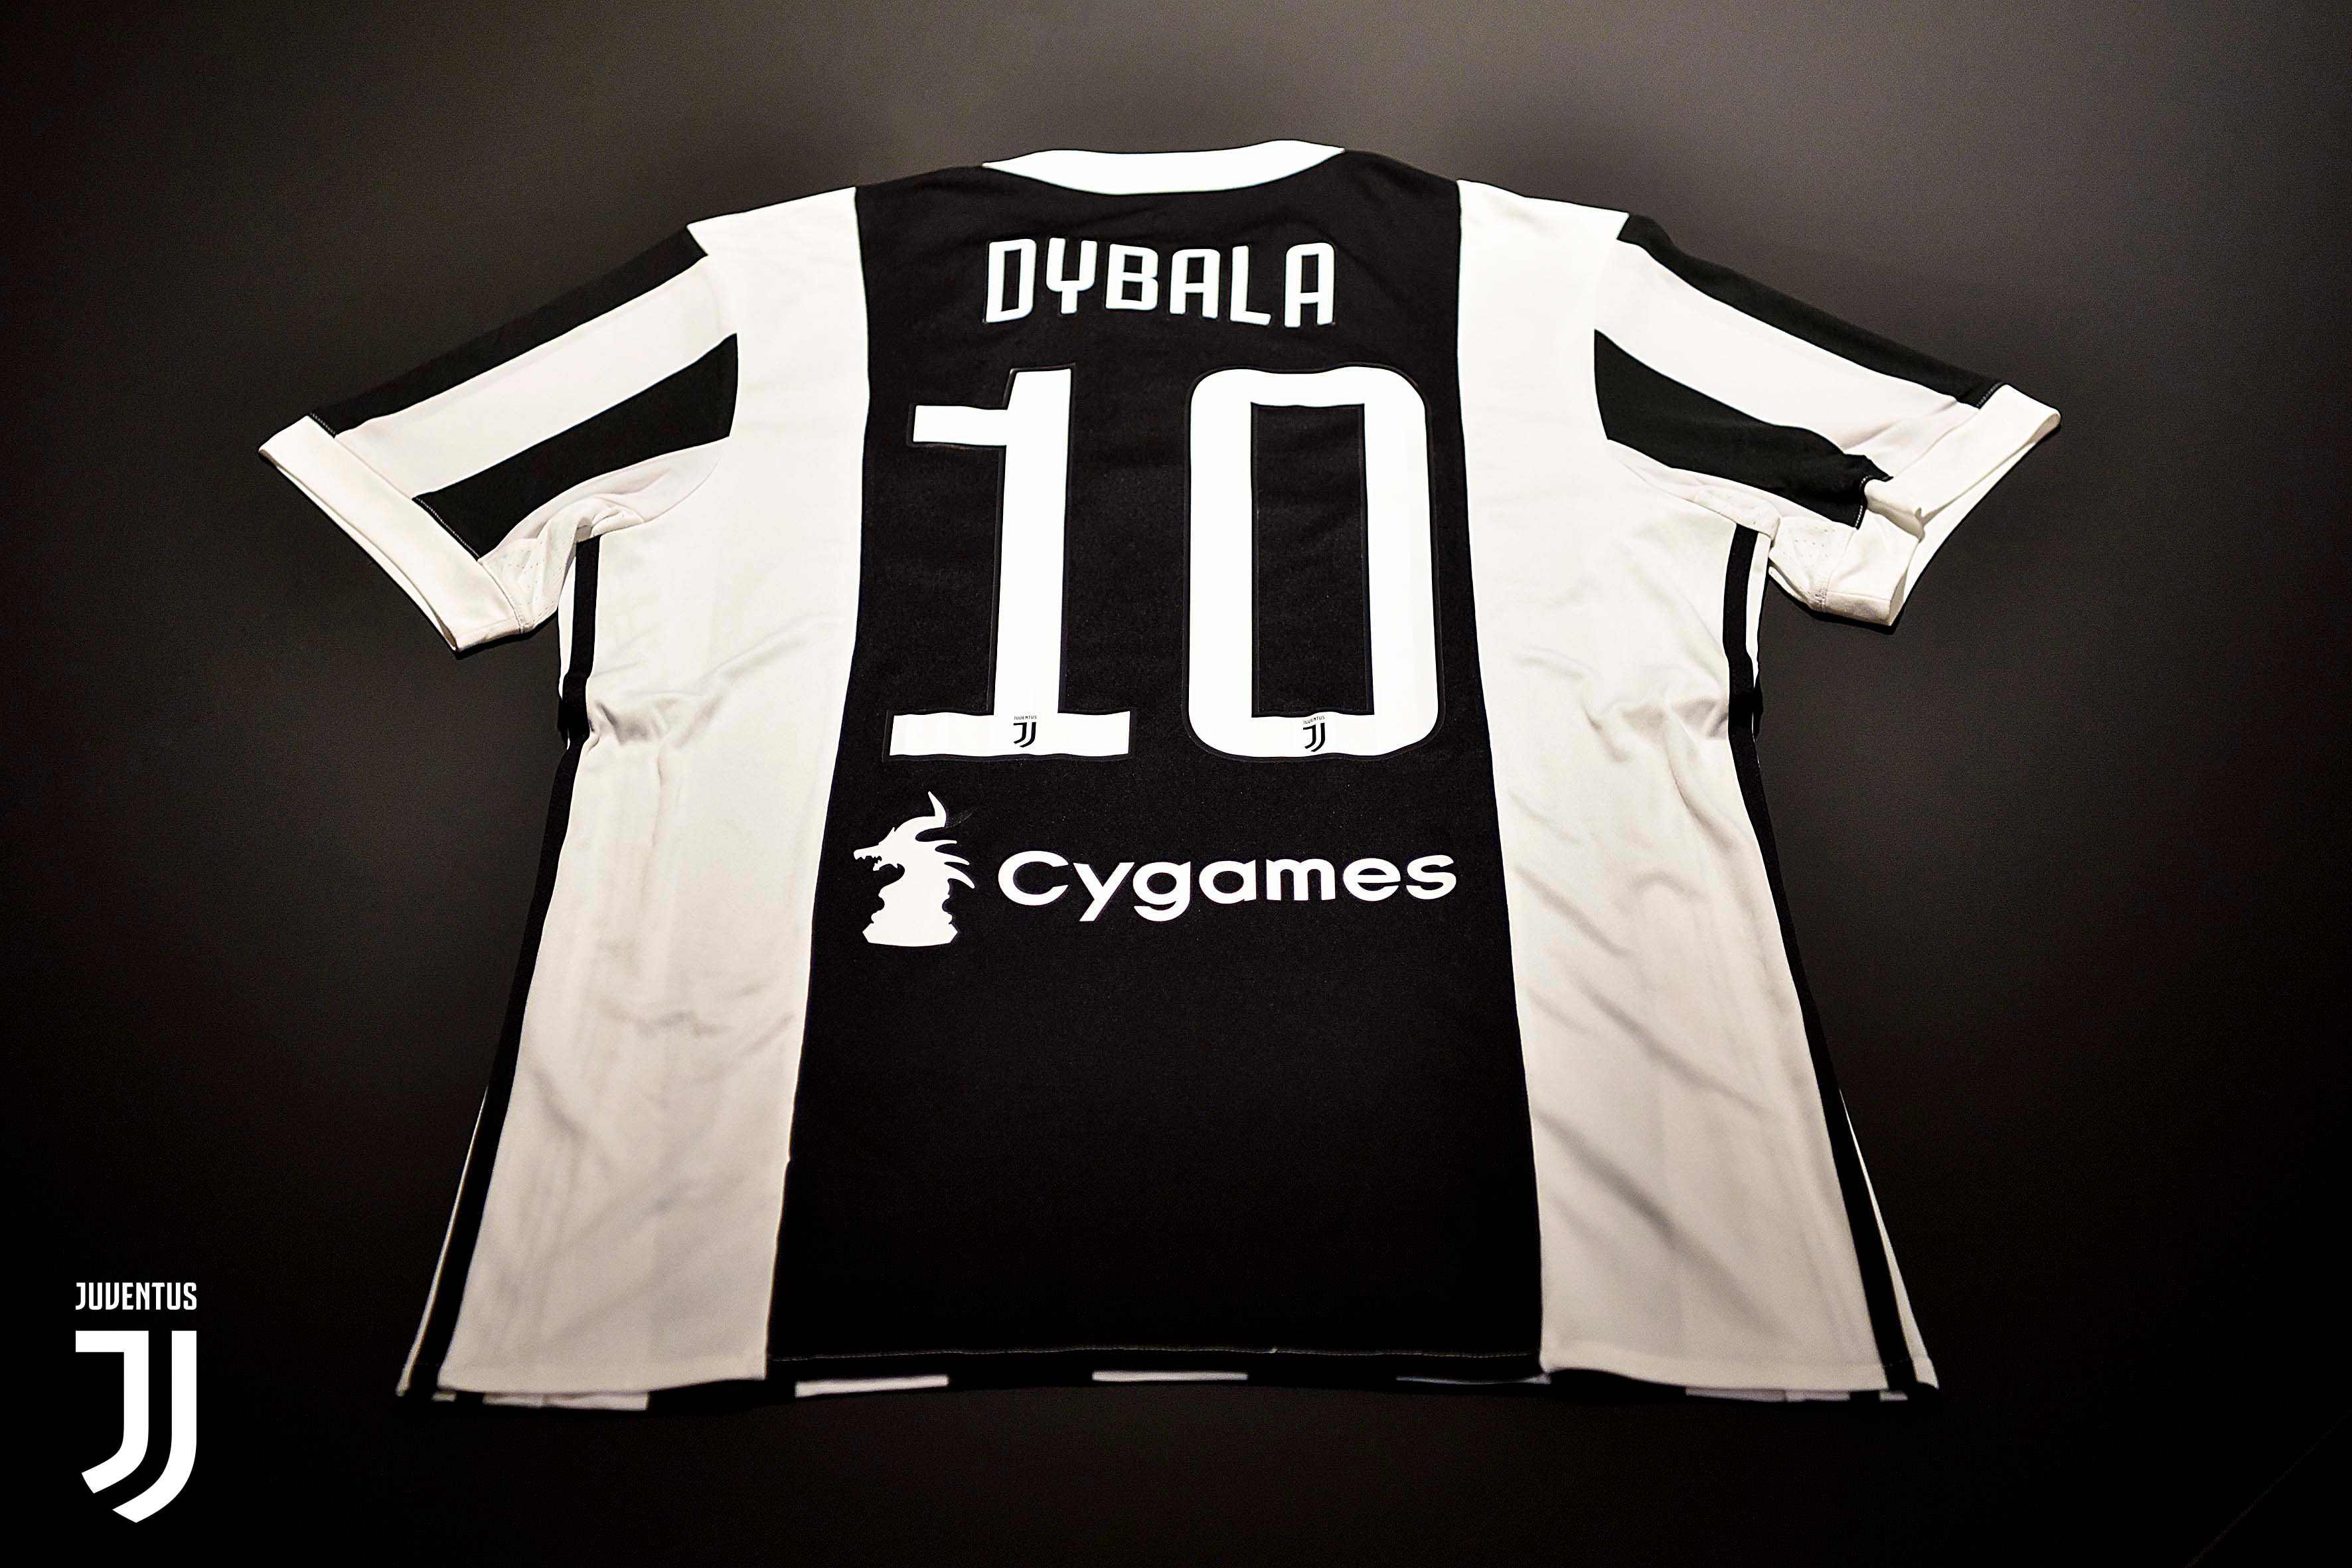 Dybala numero 10